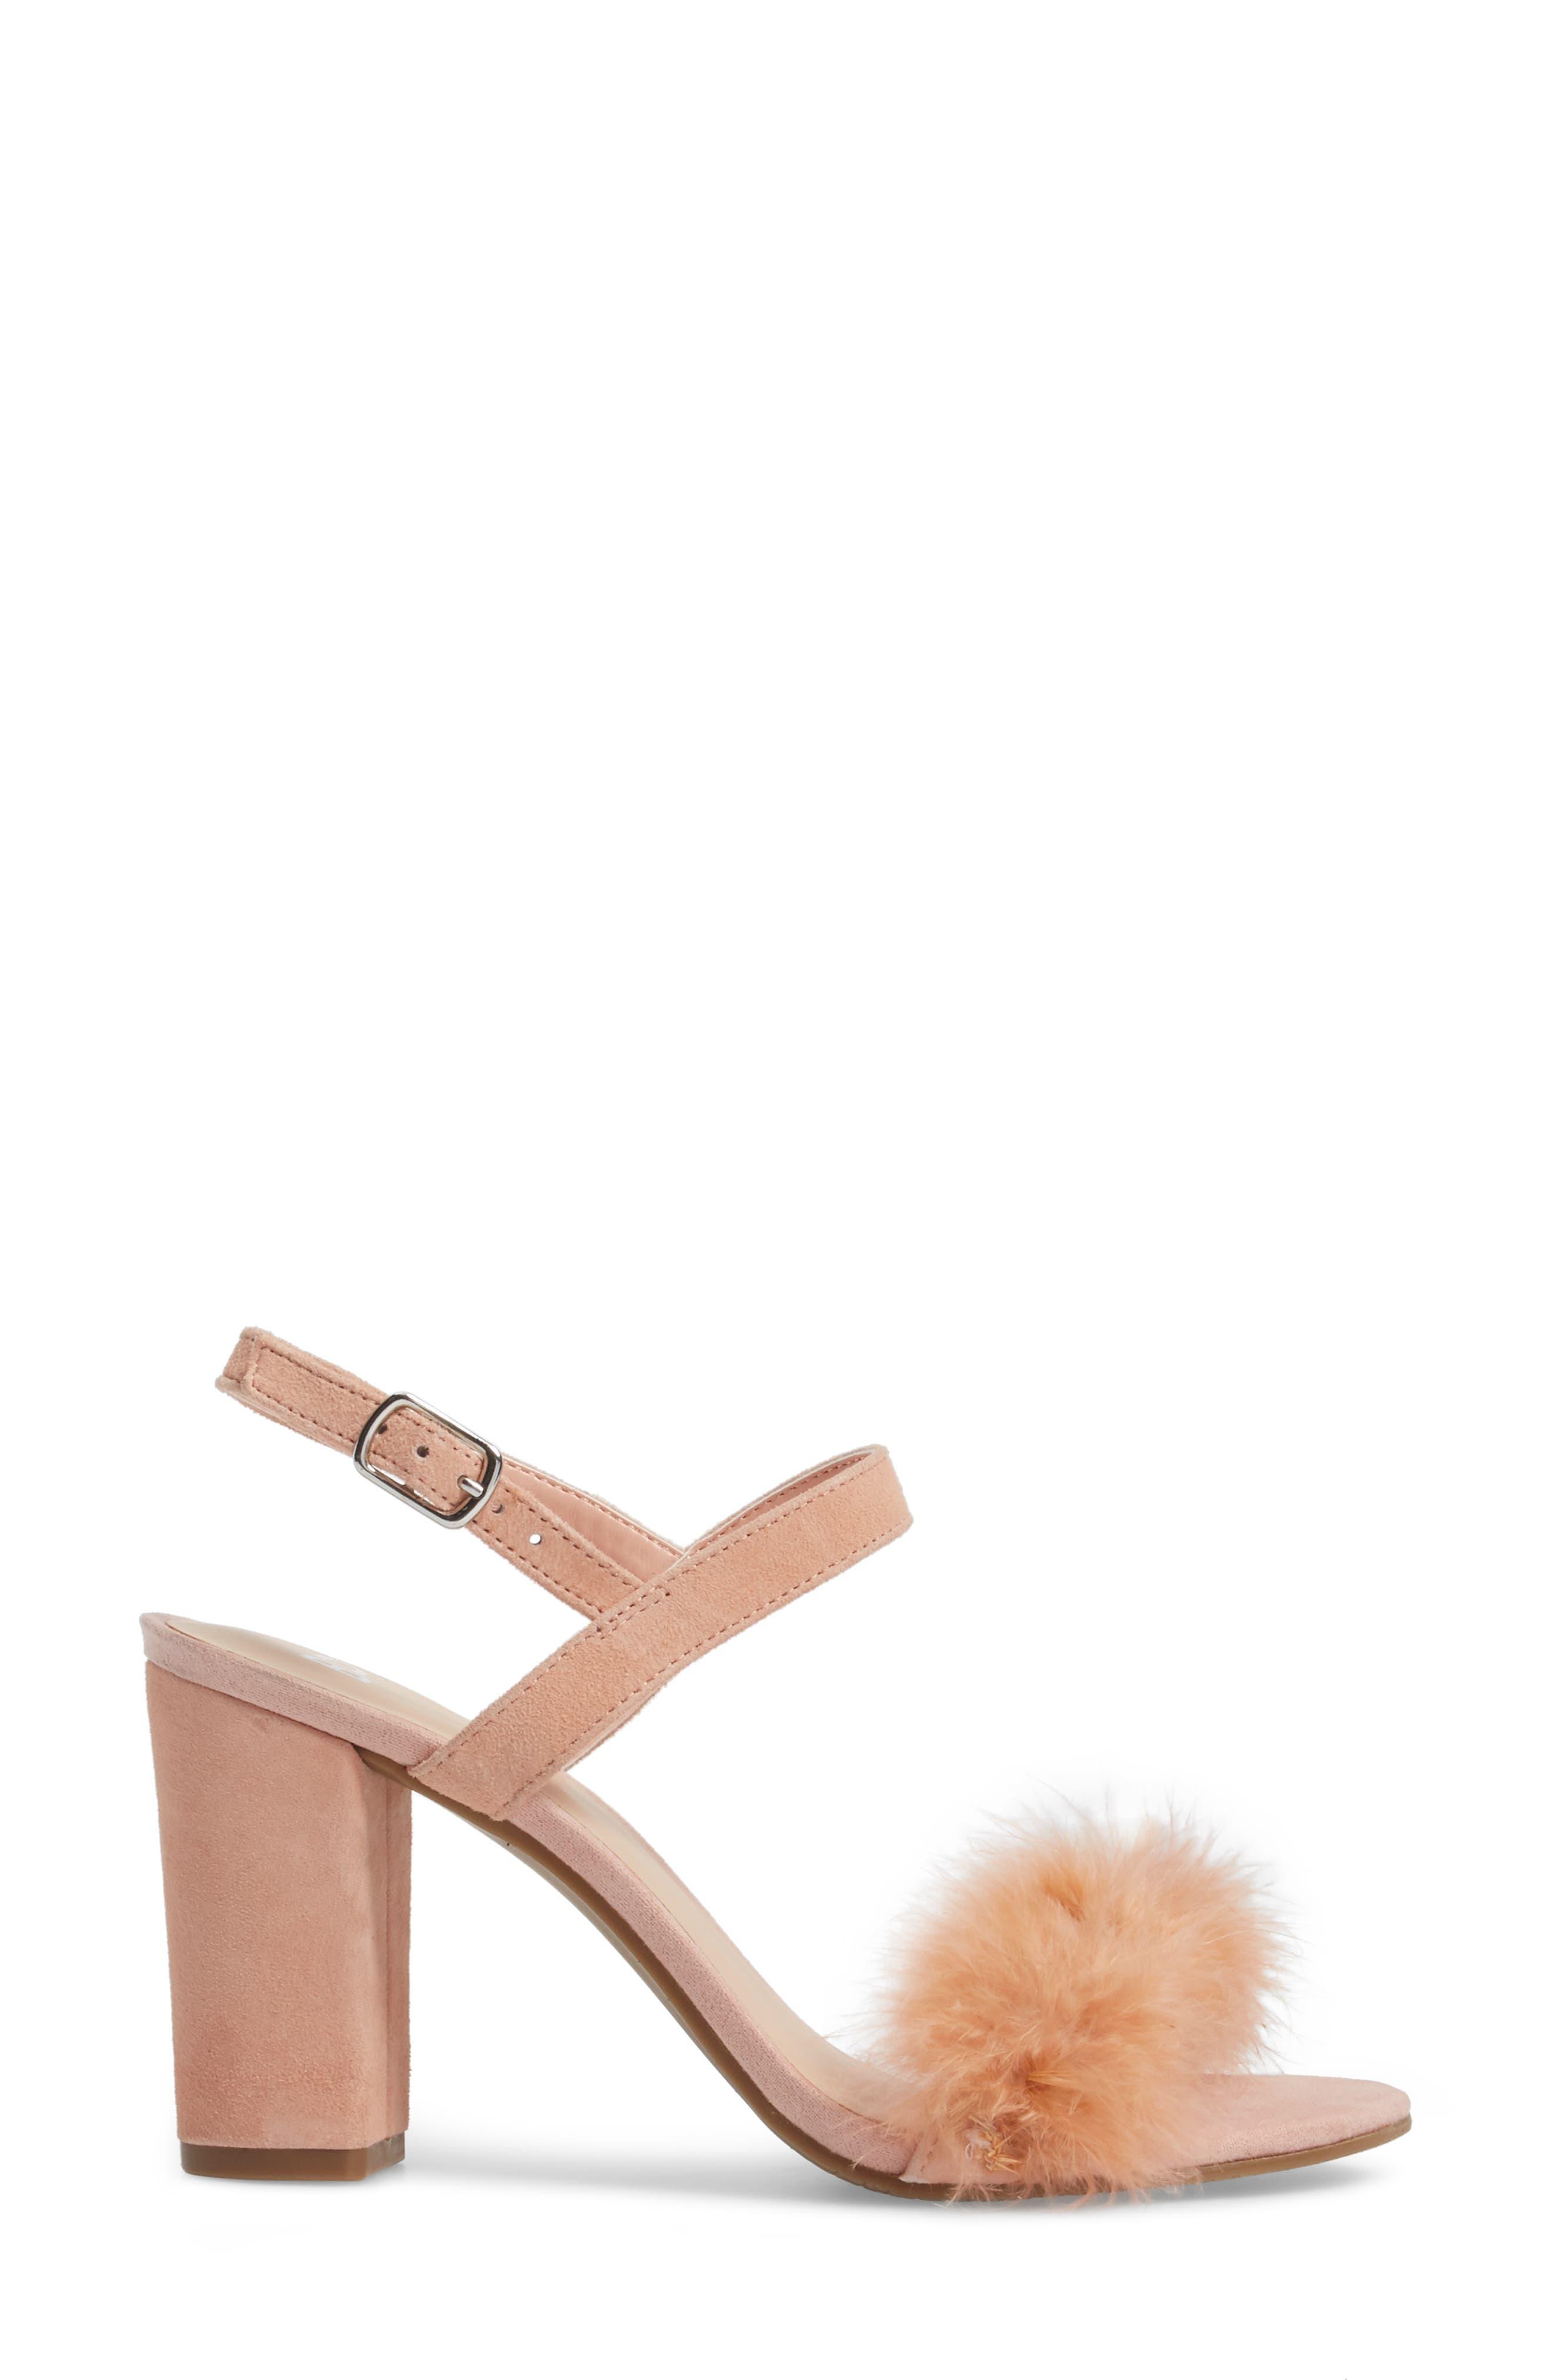 Lula Block Heel Slingback Sandal,                             Alternate thumbnail 3, color,                             Blush Feathers